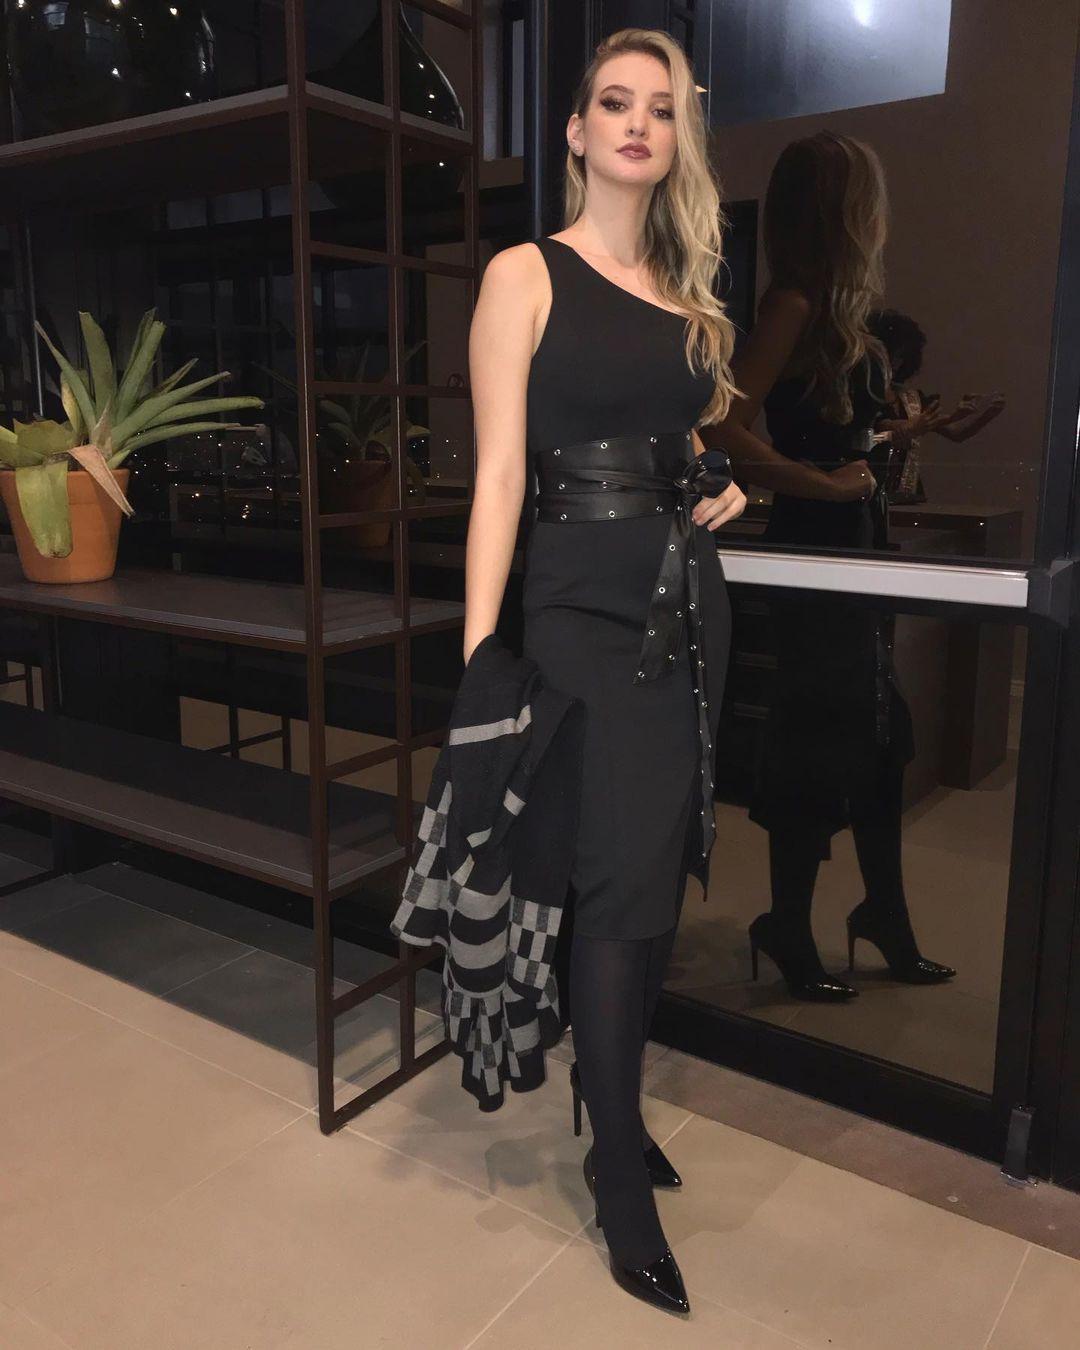 larissa neiverth, top 20 de miss brasil mundo 2019. - Página 4 Qggqbr10